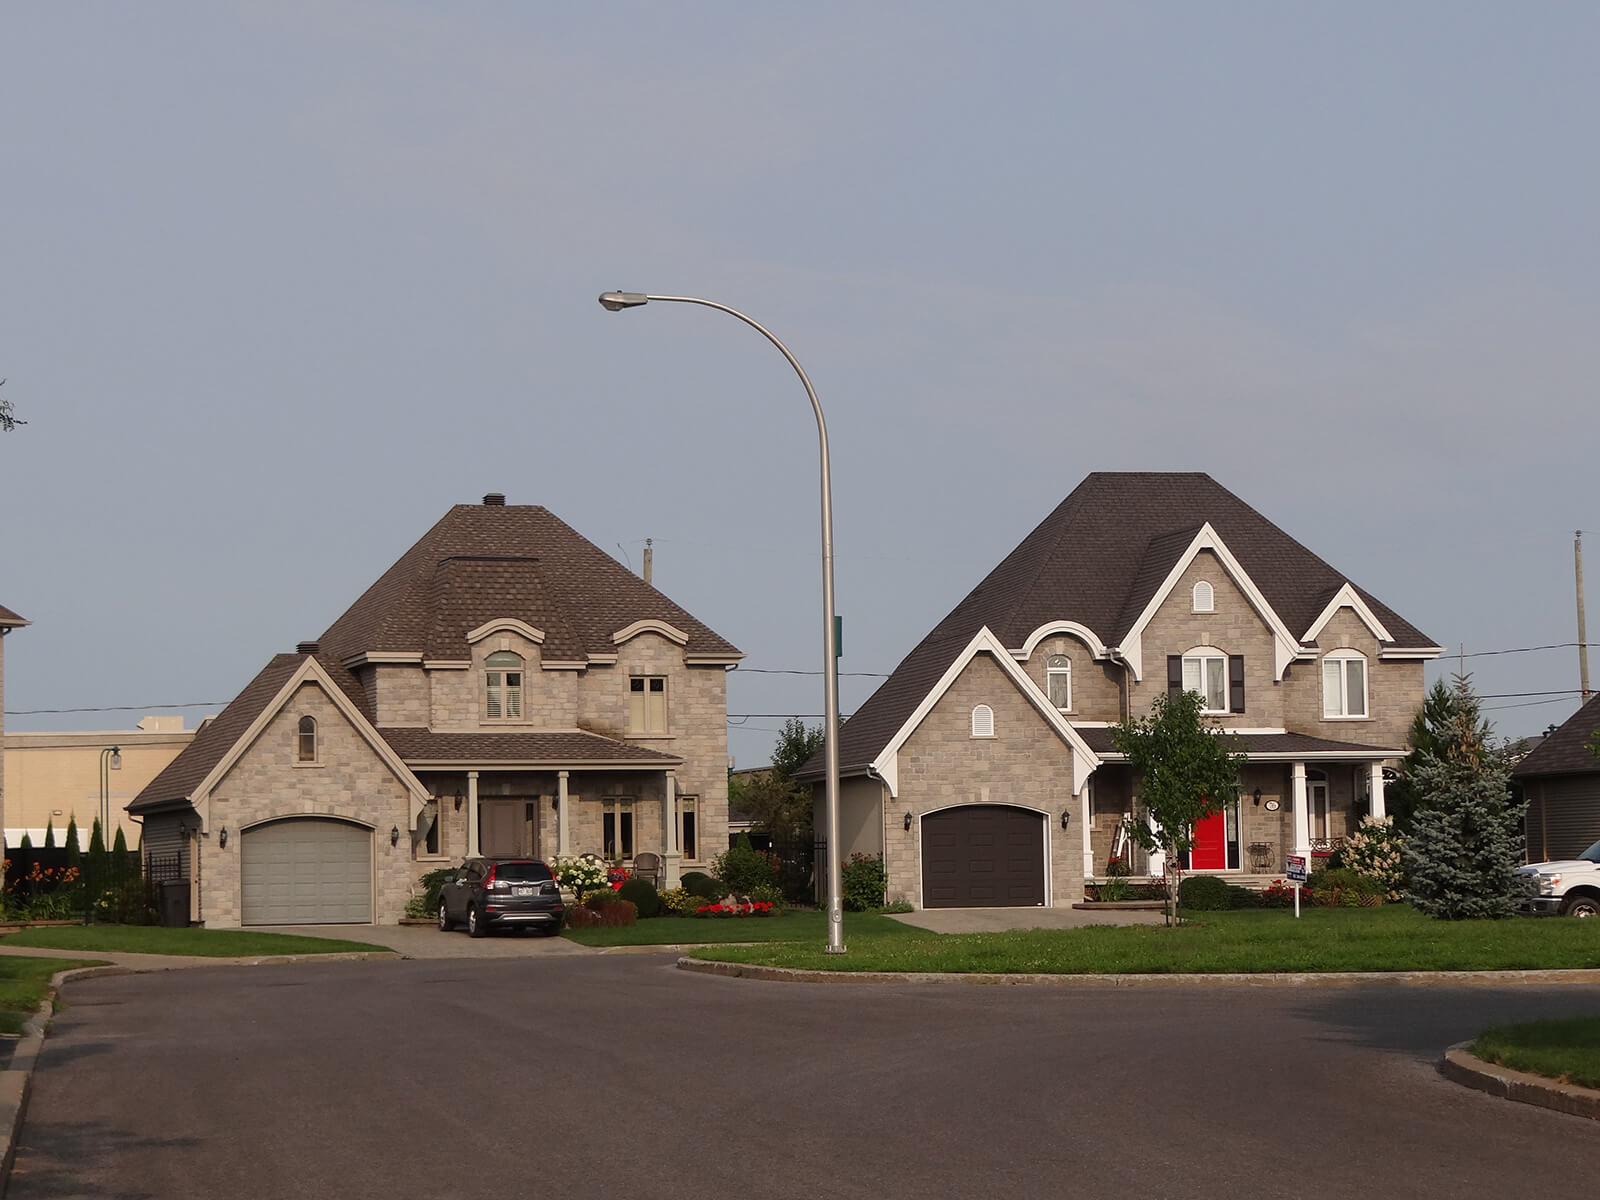 Maisons sur la rue Nicolas